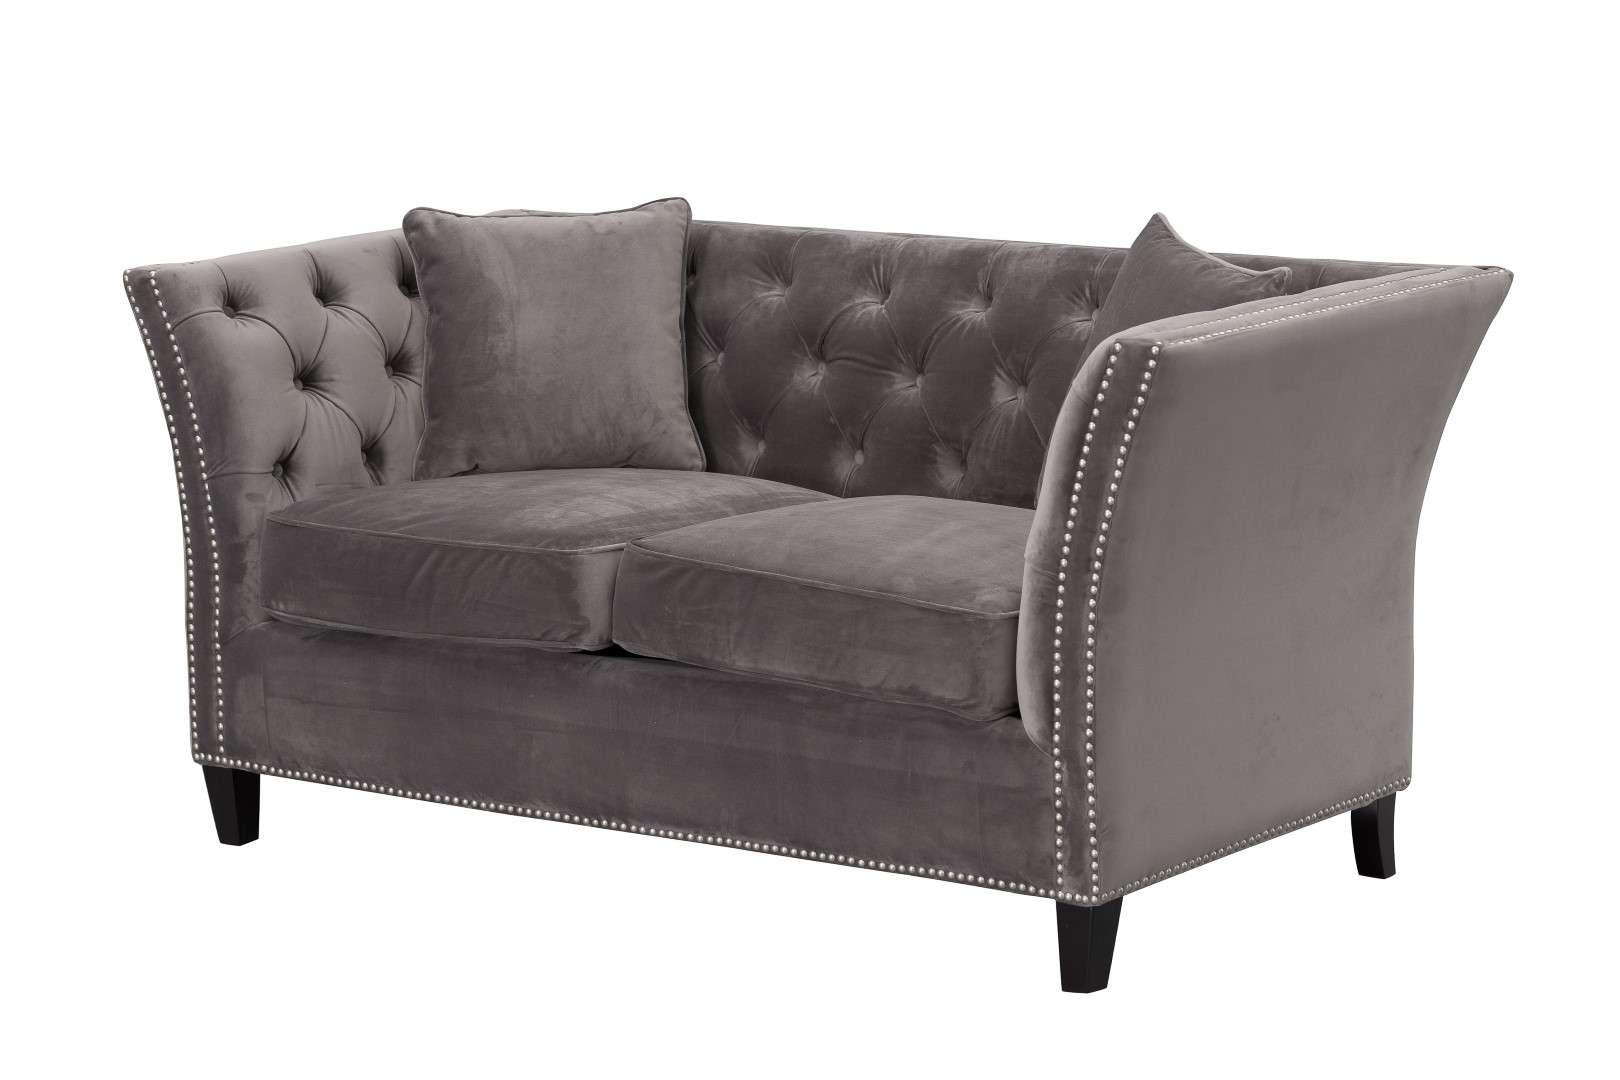 Sofa Chesterfield Modern Velvet Dark Grey 2-Sitzer